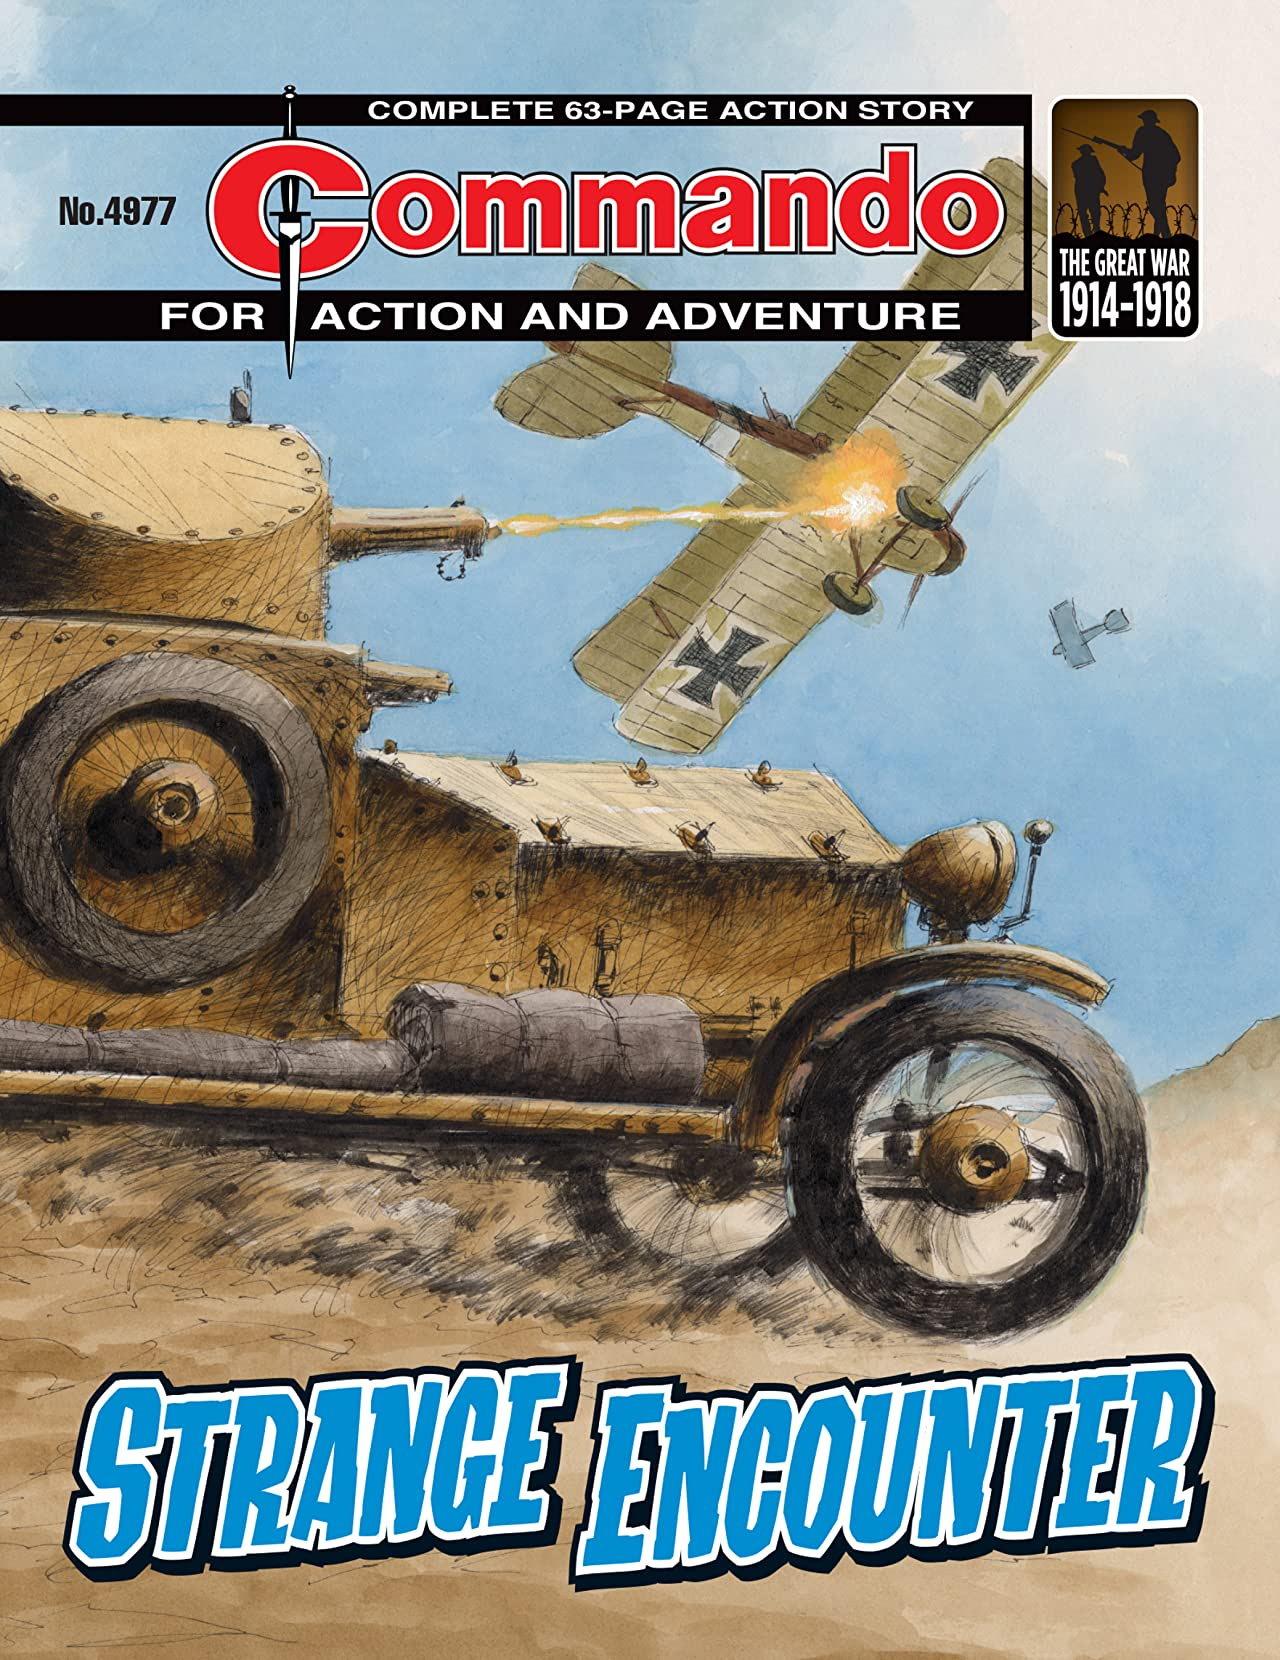 Commando #4977: Strange Encounter